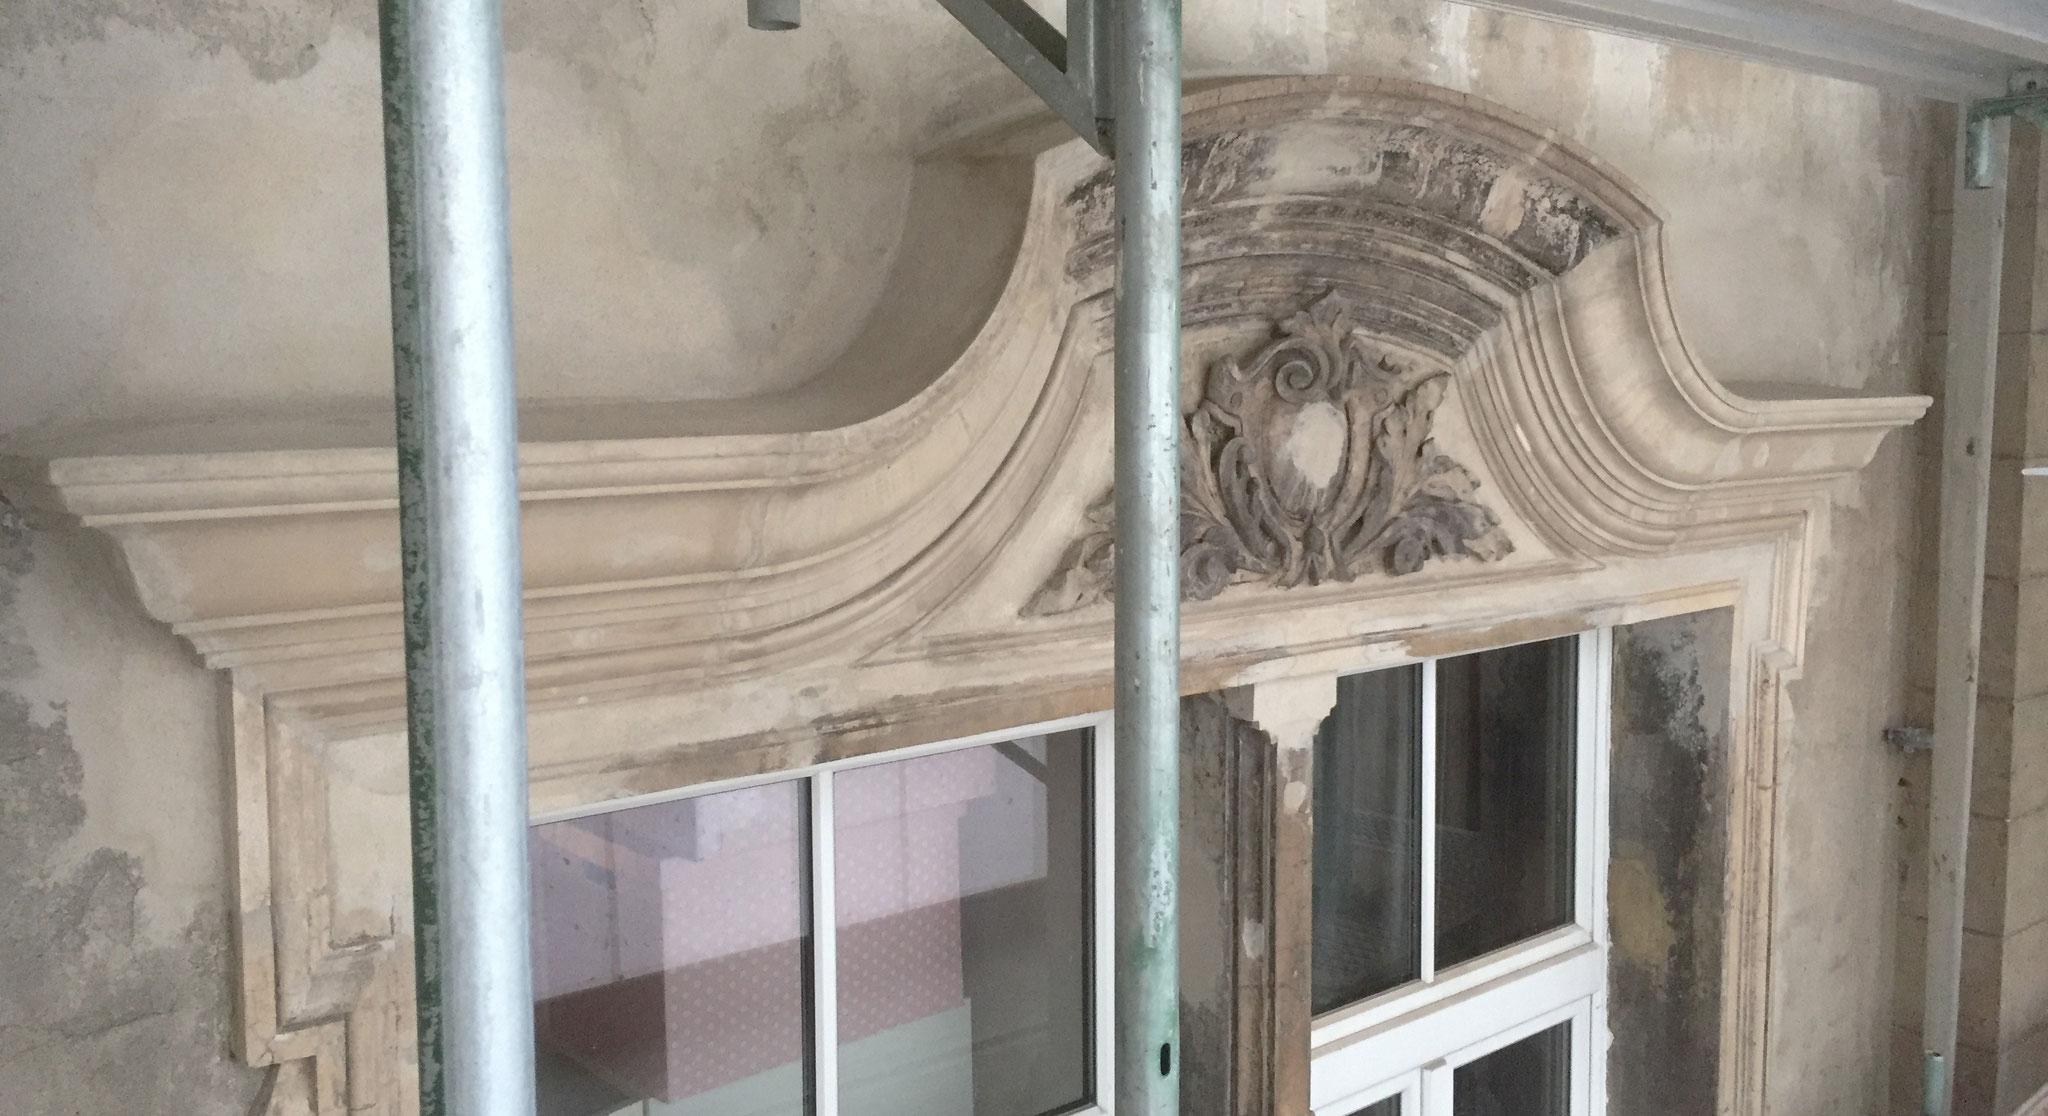 Geschweifte Fensterverdachung nach Rekonstruktion in Ronamzement